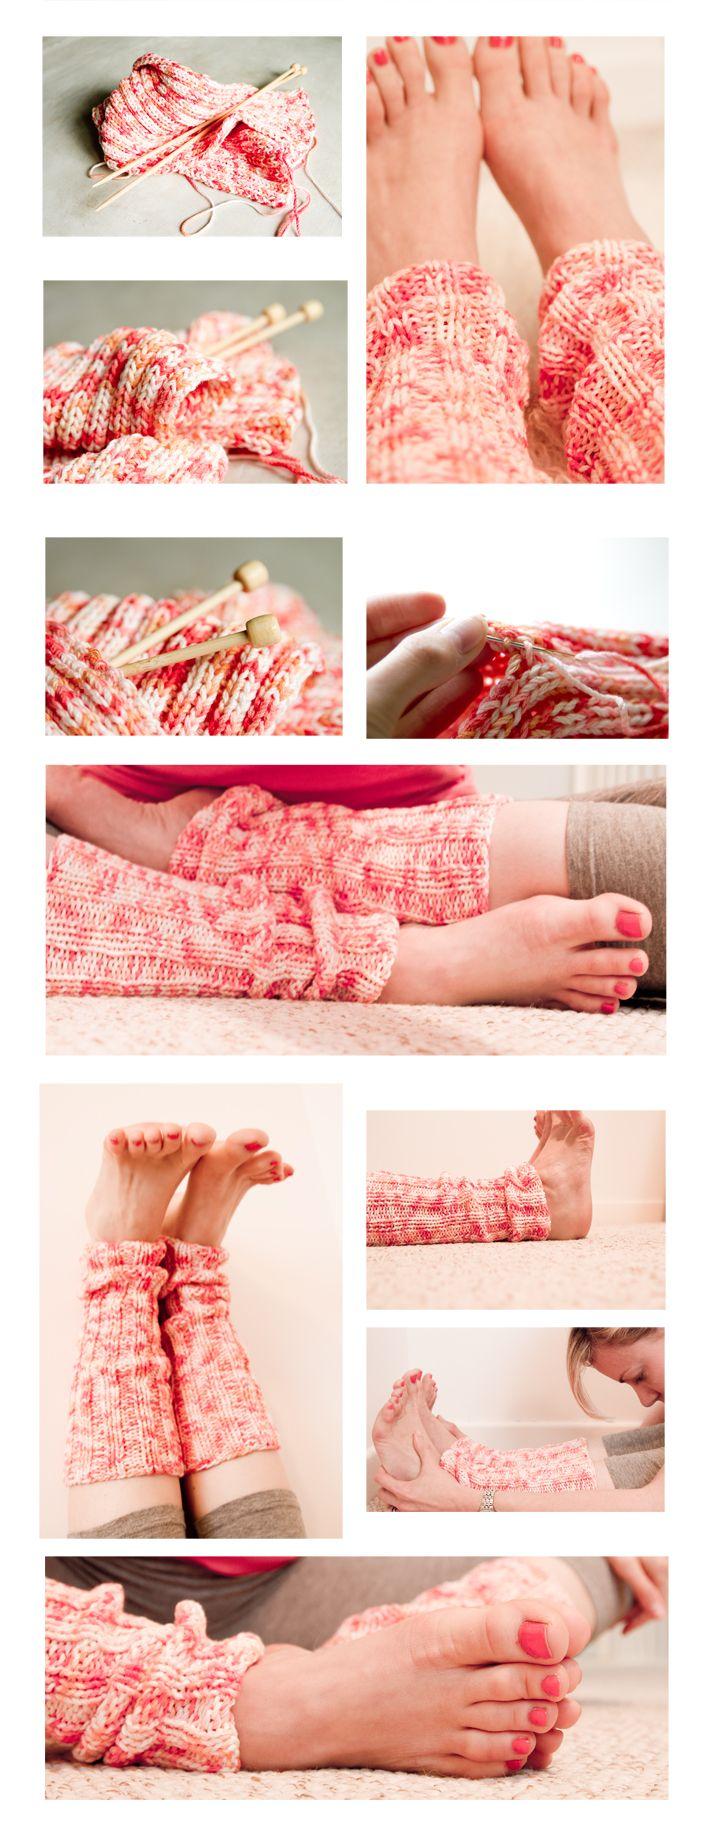 Yoga leg warmers knitting pattern | Yogahound blog